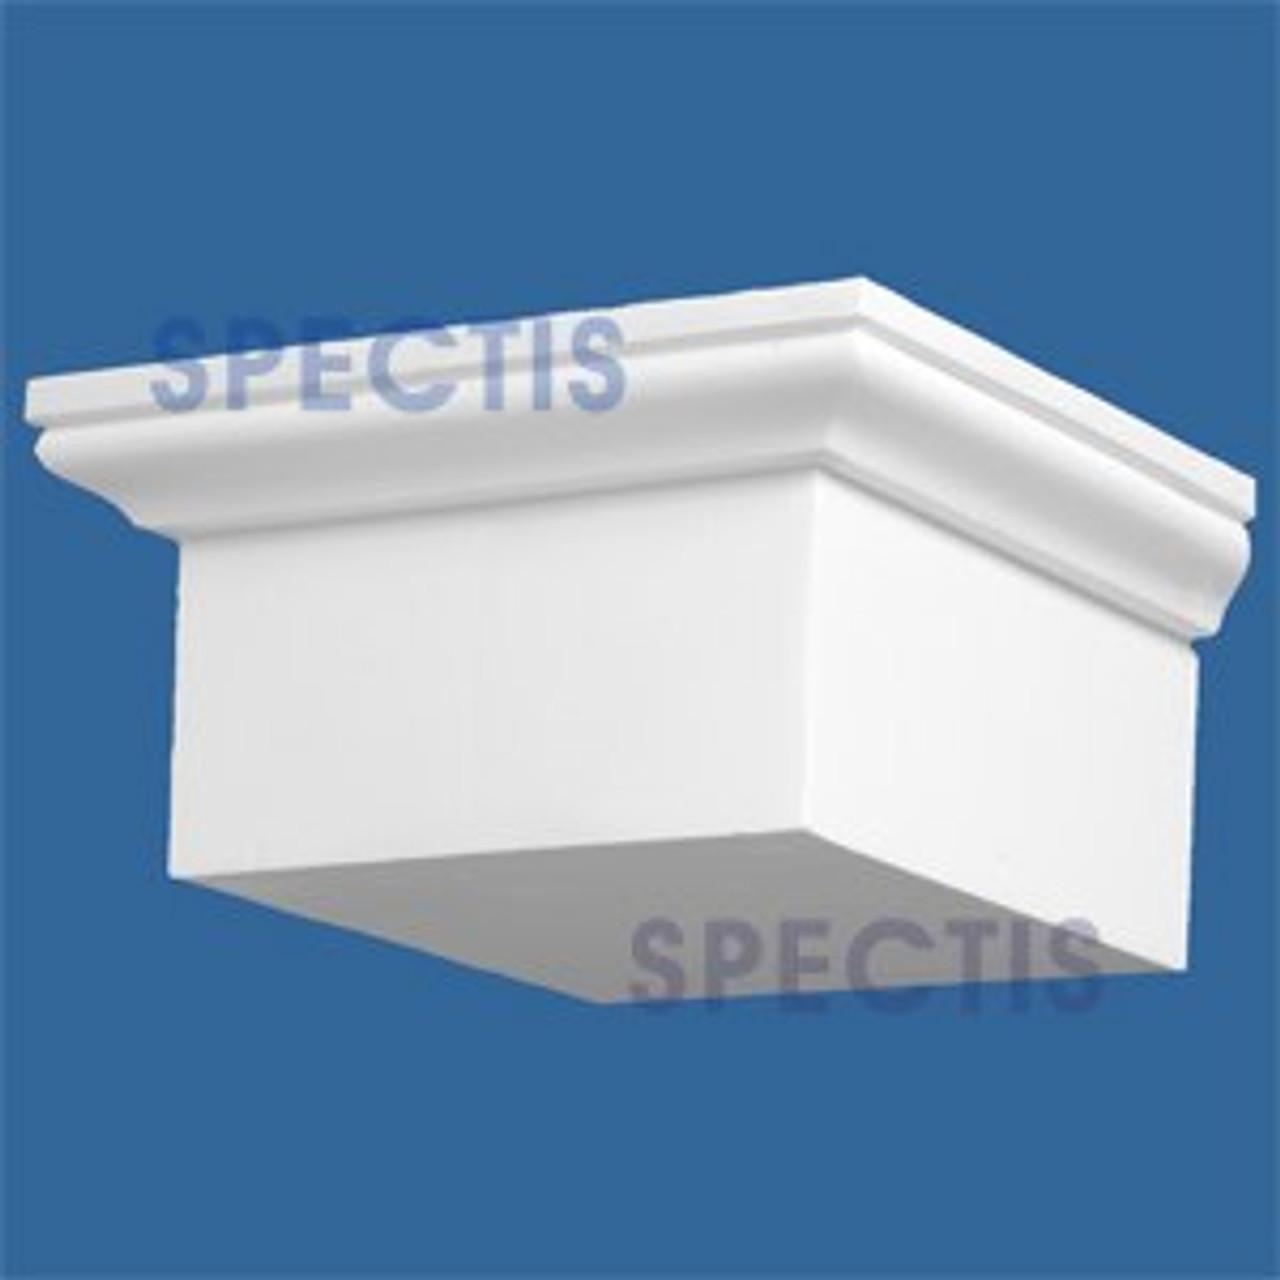 "BL2736 Corbel Block or Eave Bracket 9.5""W x 5""H x 9.5"" P"